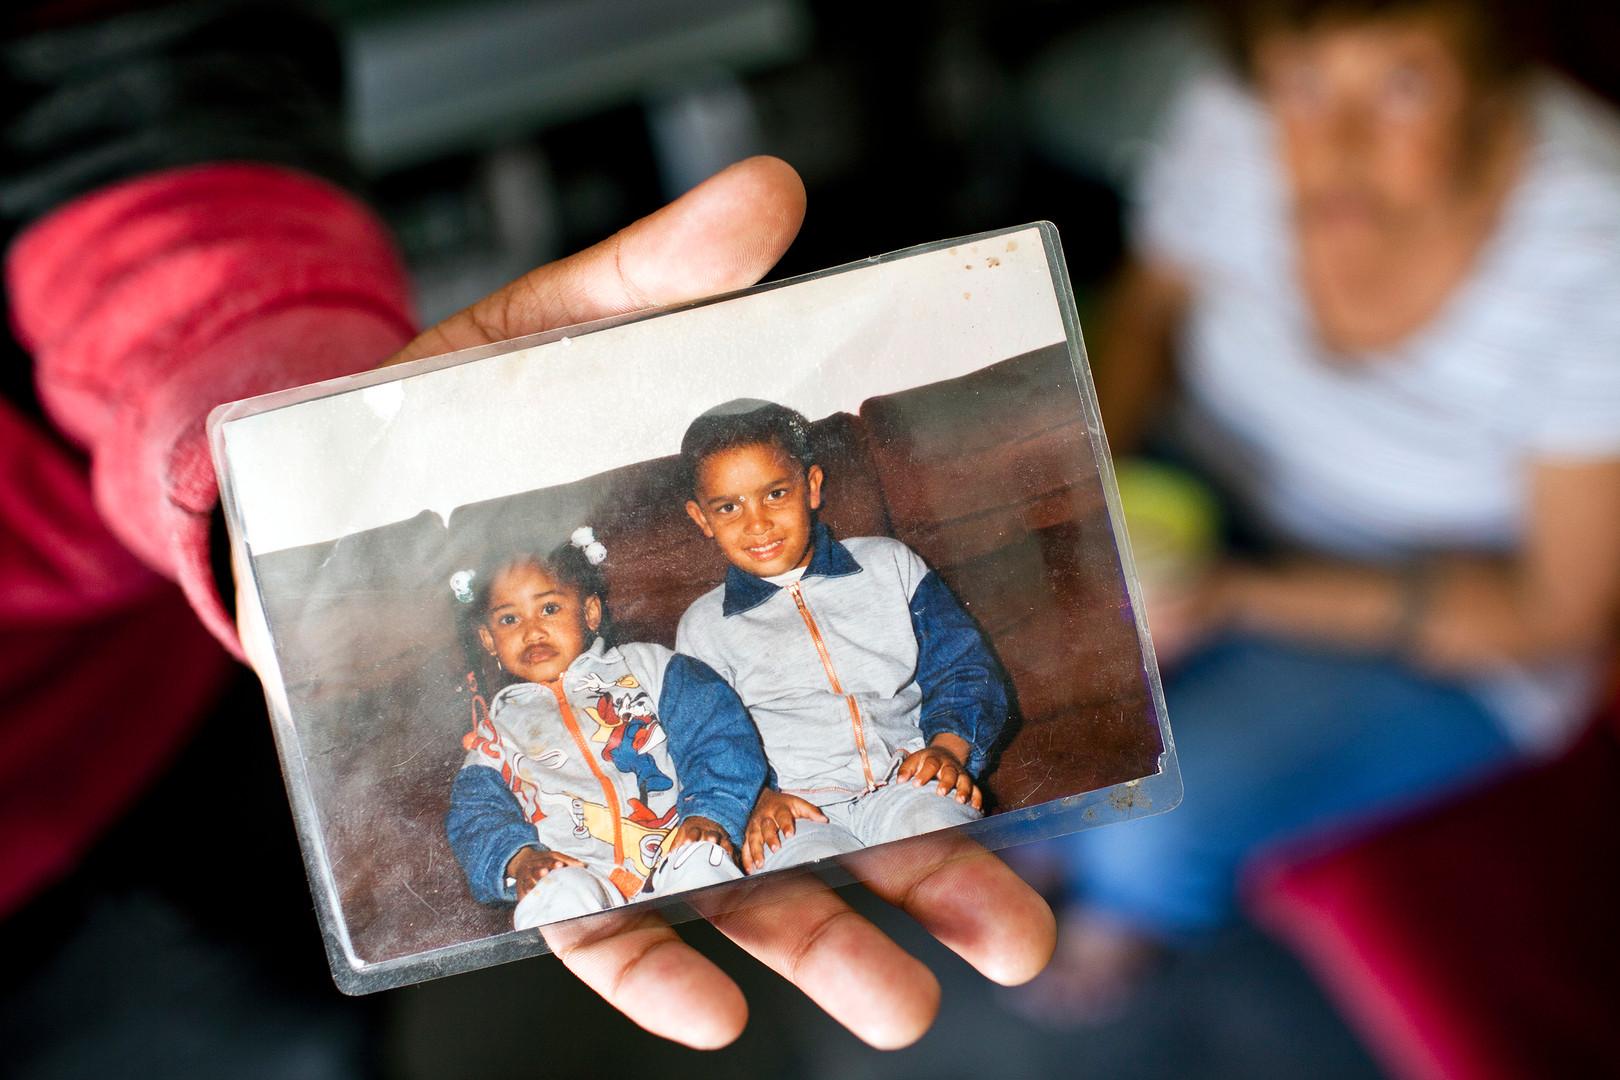 NGO_CSR-RLABS-South Africa 010.jpg